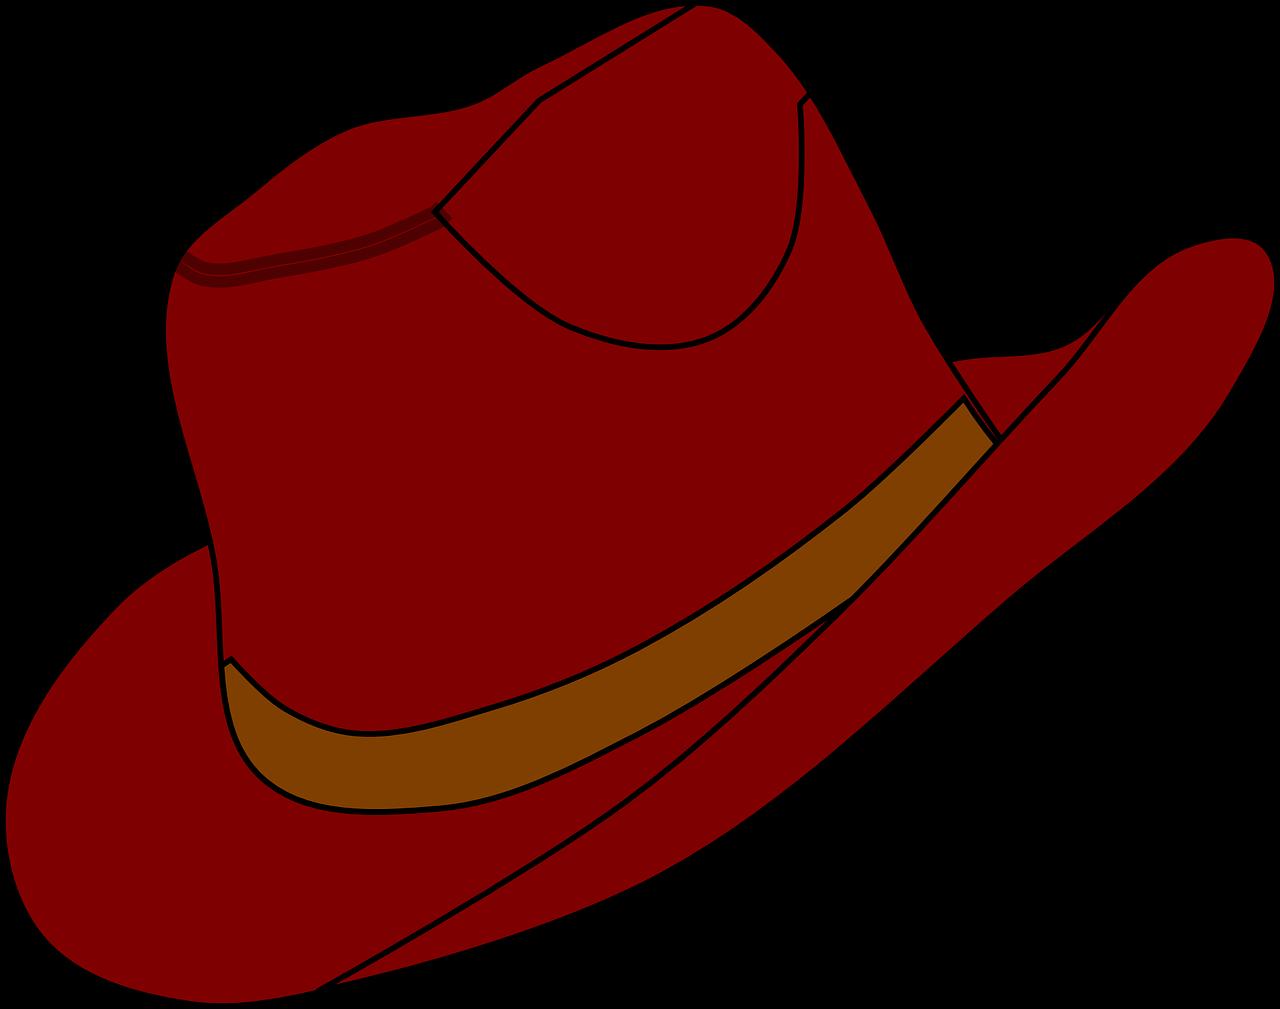 Cowboy hat clipart free danaspaj top-Cowboy hat clipart free danaspaj top-6